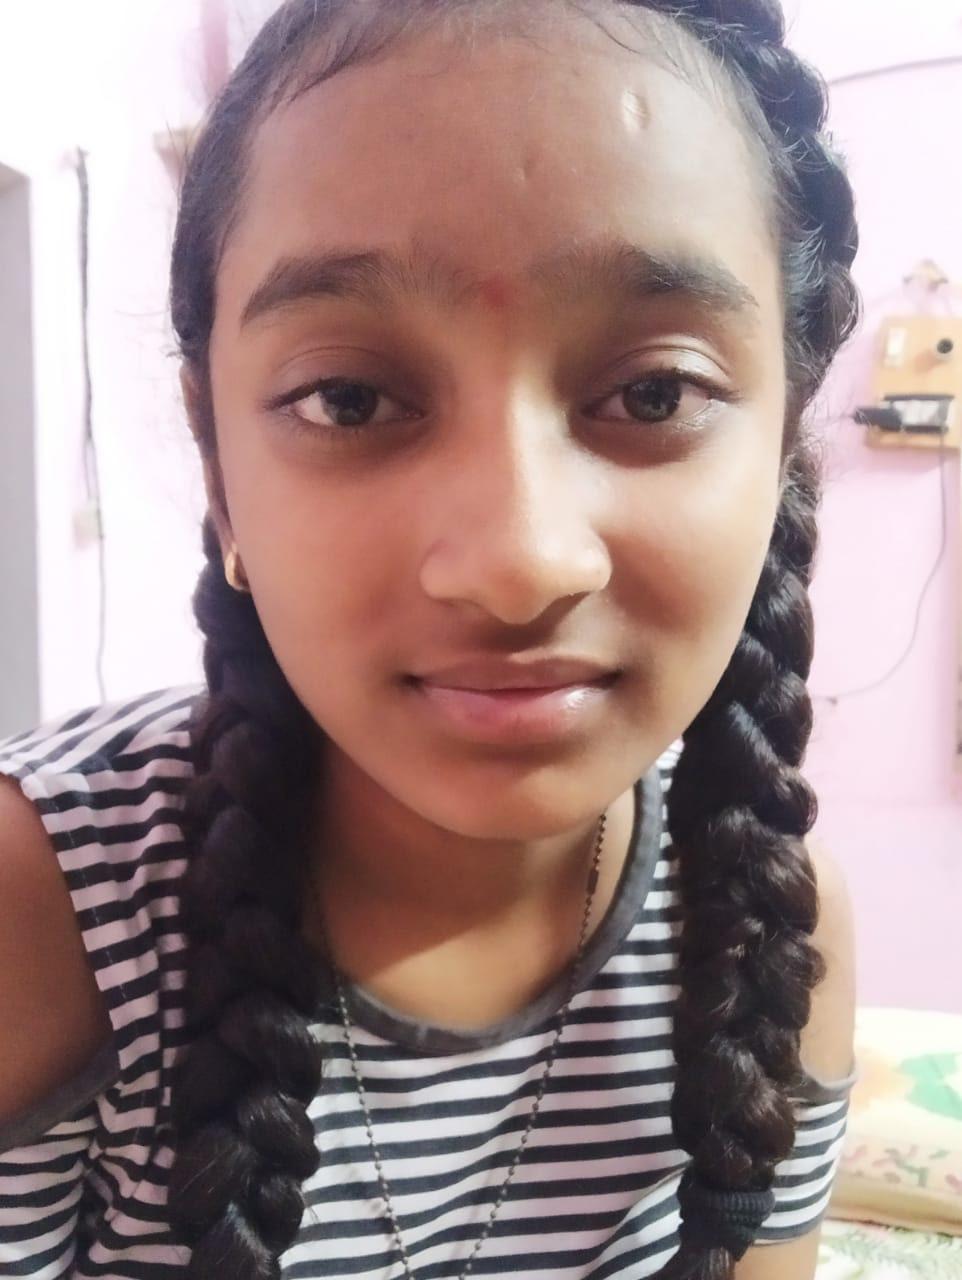 Mamta Diwakar needs your help for her children